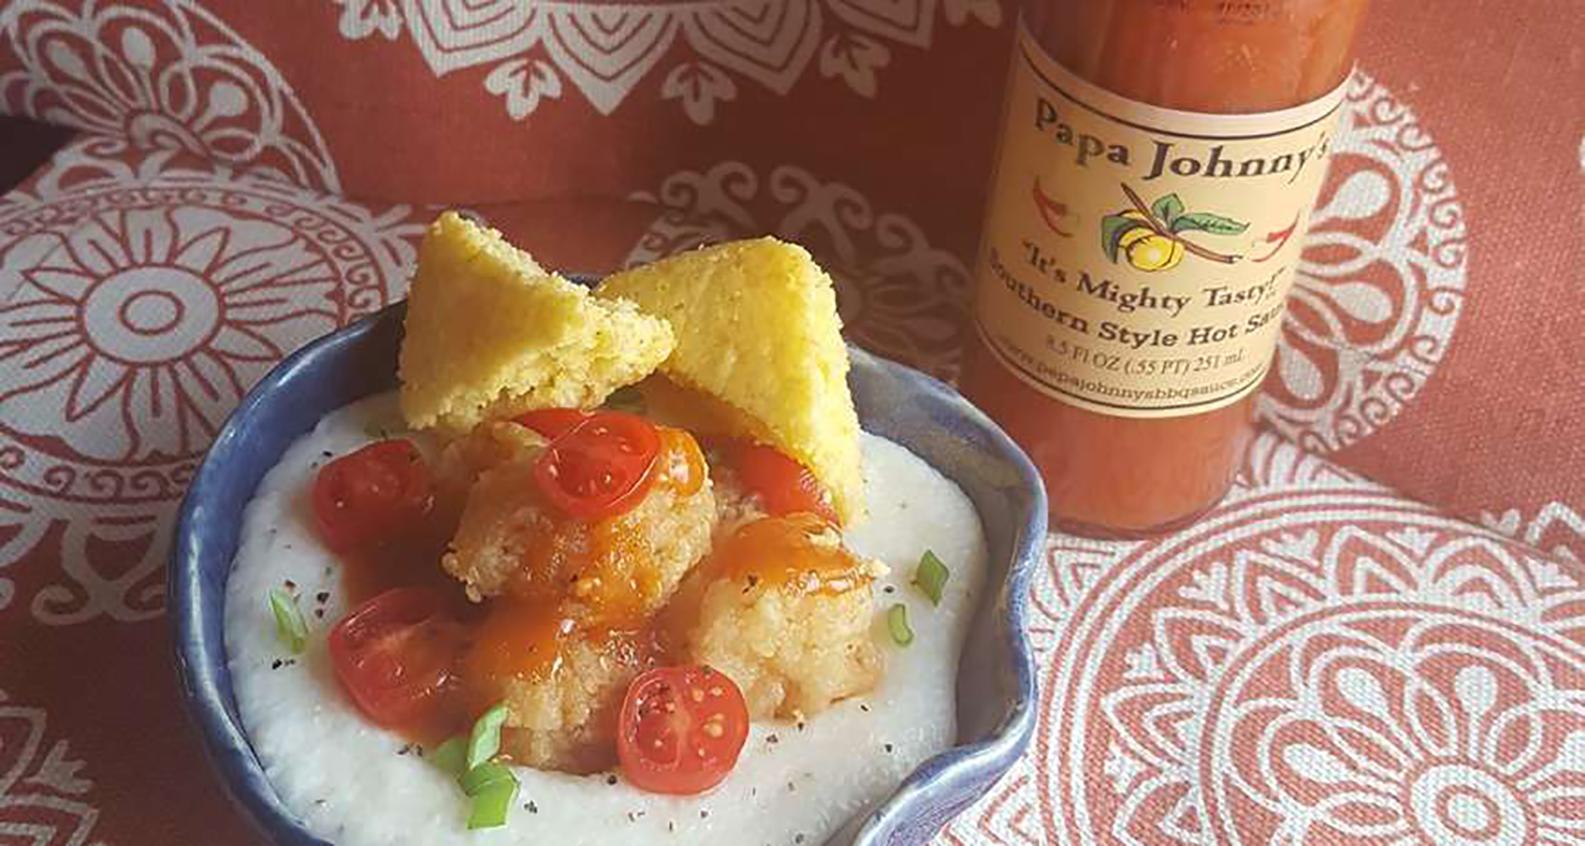 Papa Johnny's Southern Style Hot Sauce